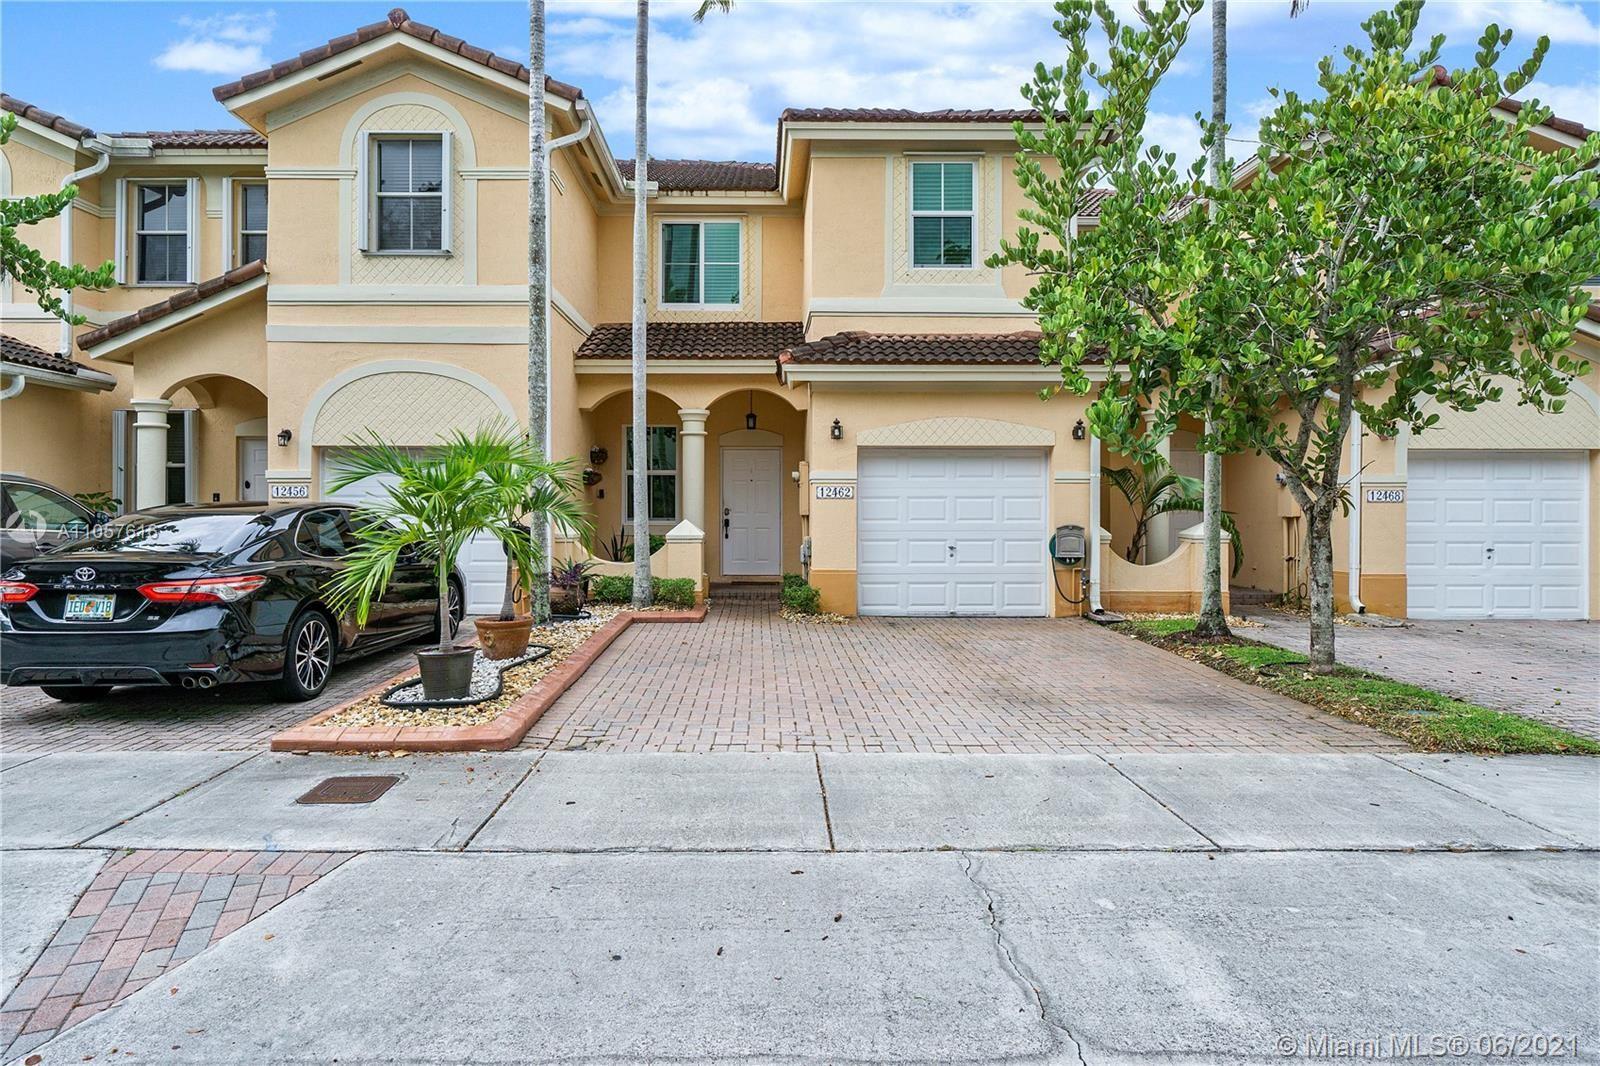 12462 SW 121st Ln #12462, Miami, FL 33186 - #: A11057616